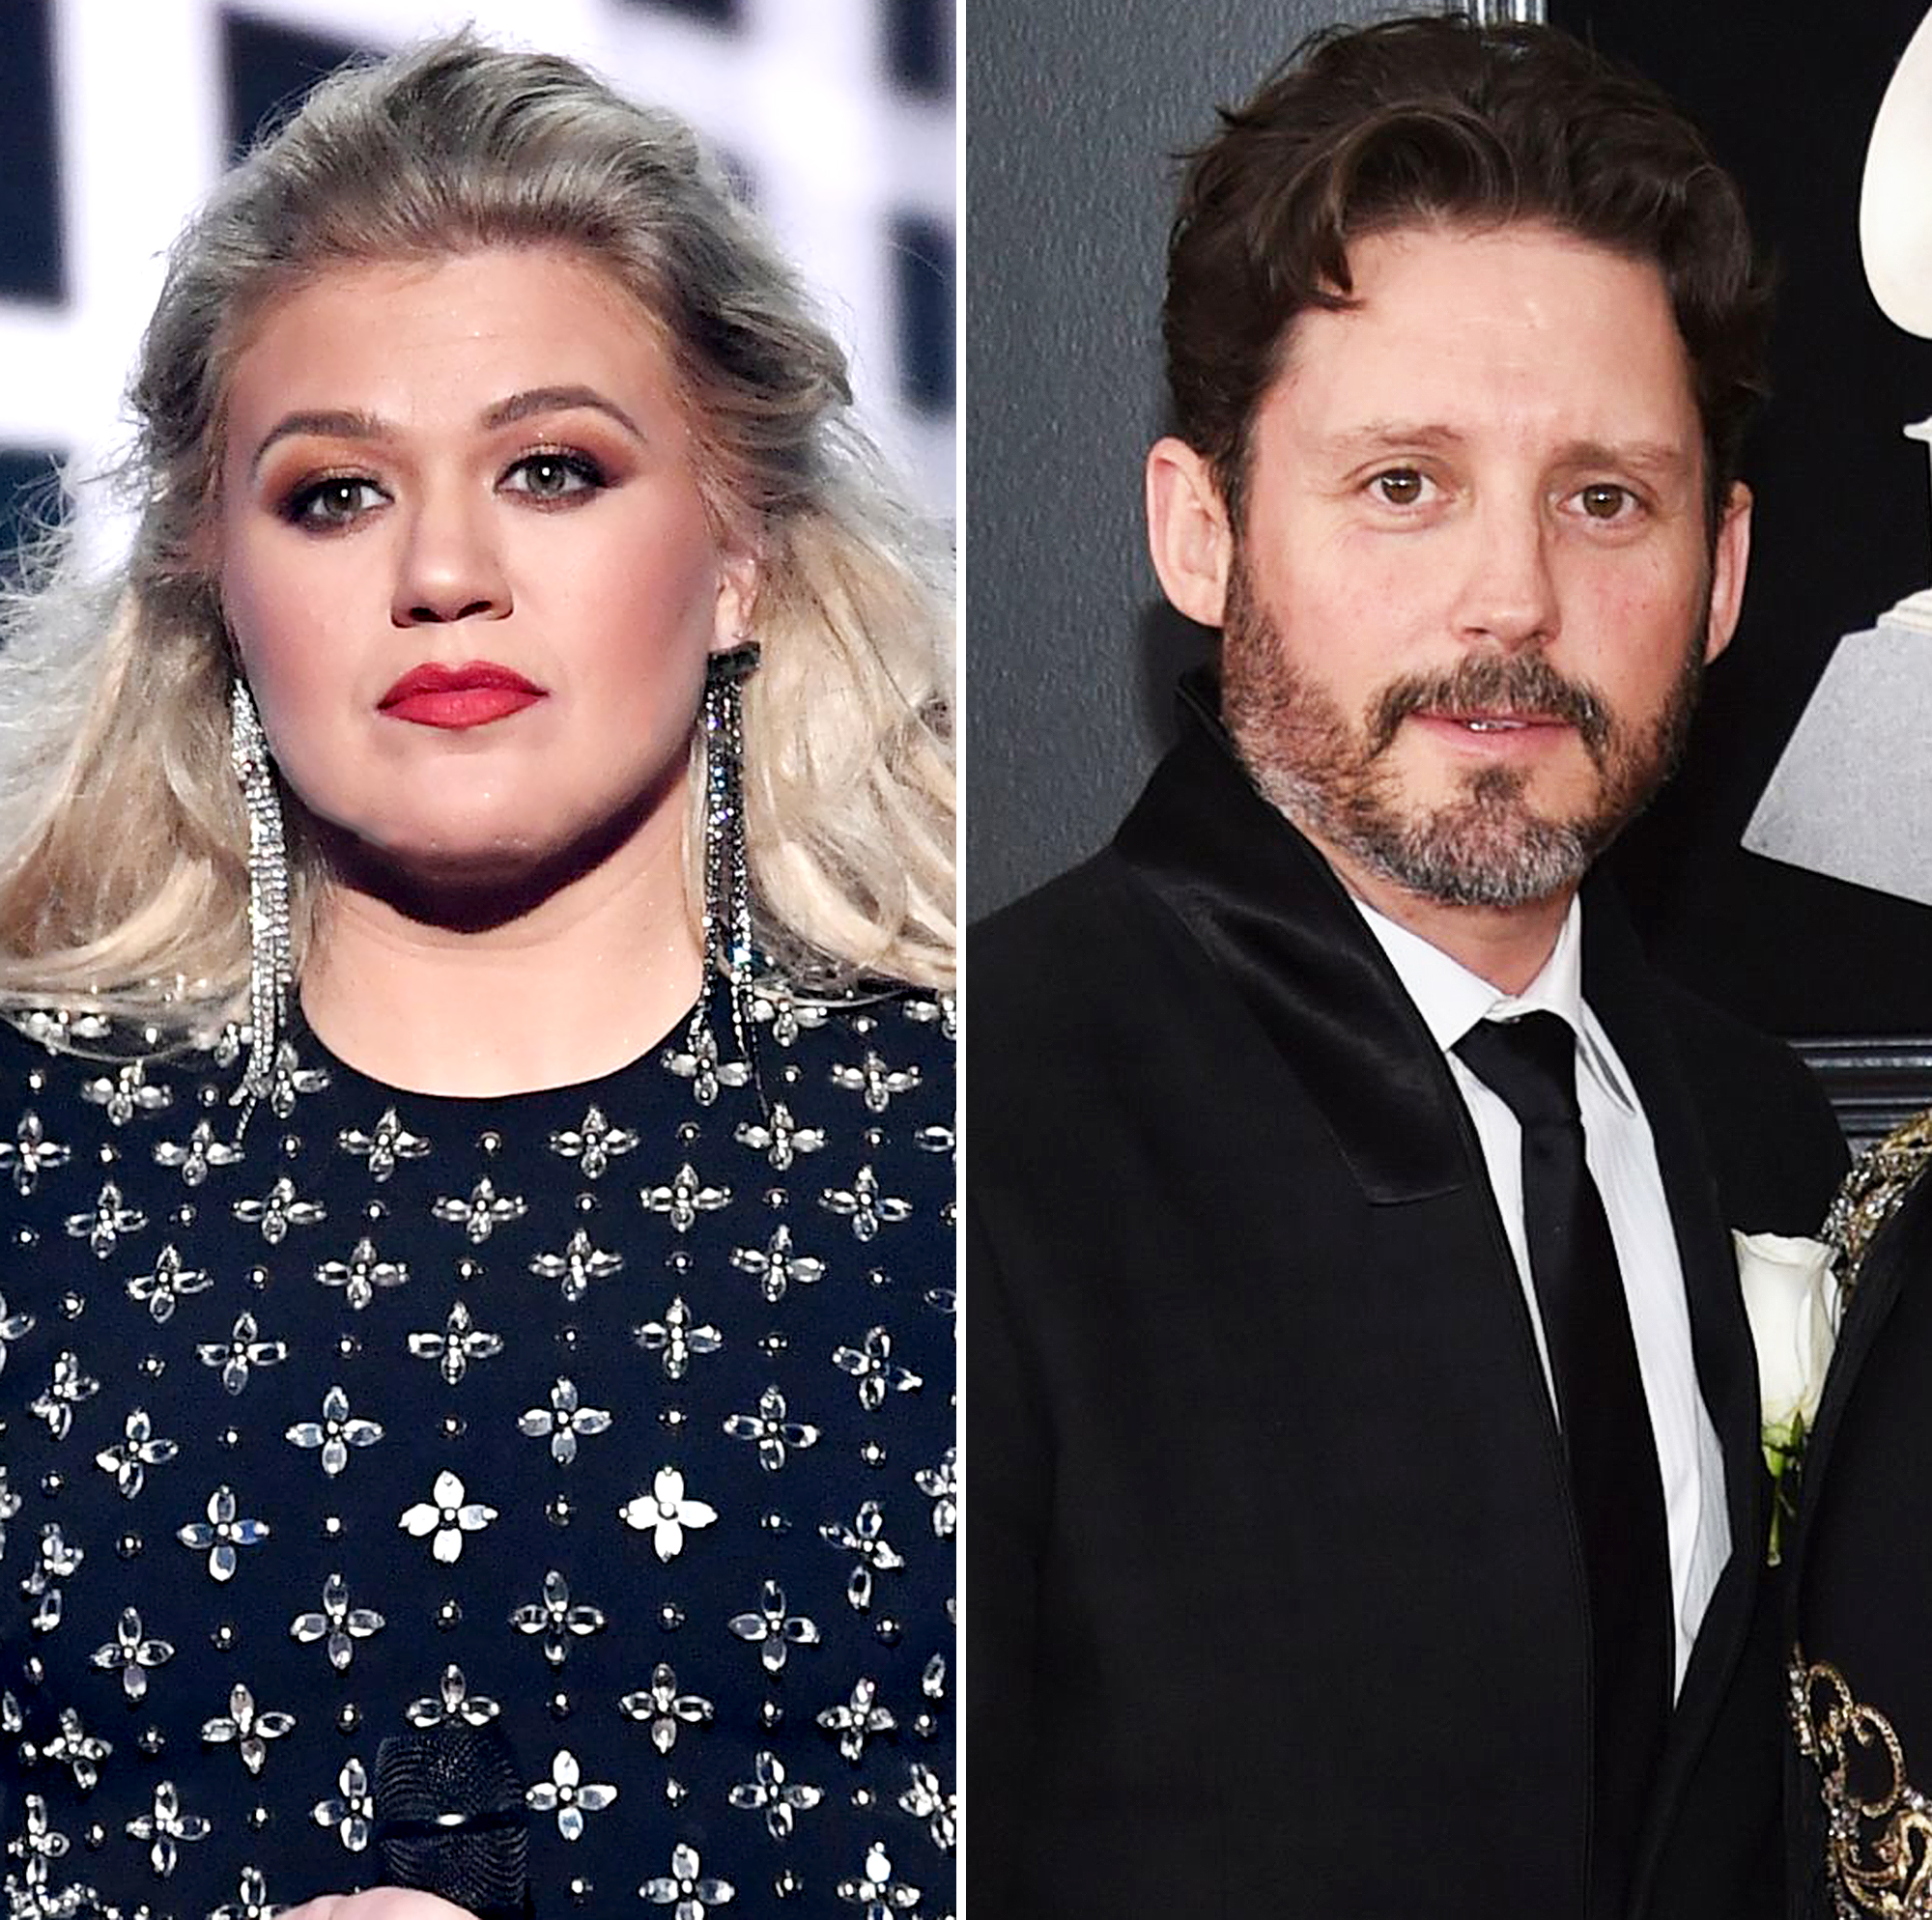 Kelly Clarkson's Estranged Husband Brandon Blackstock Denies Defraud Claims 1